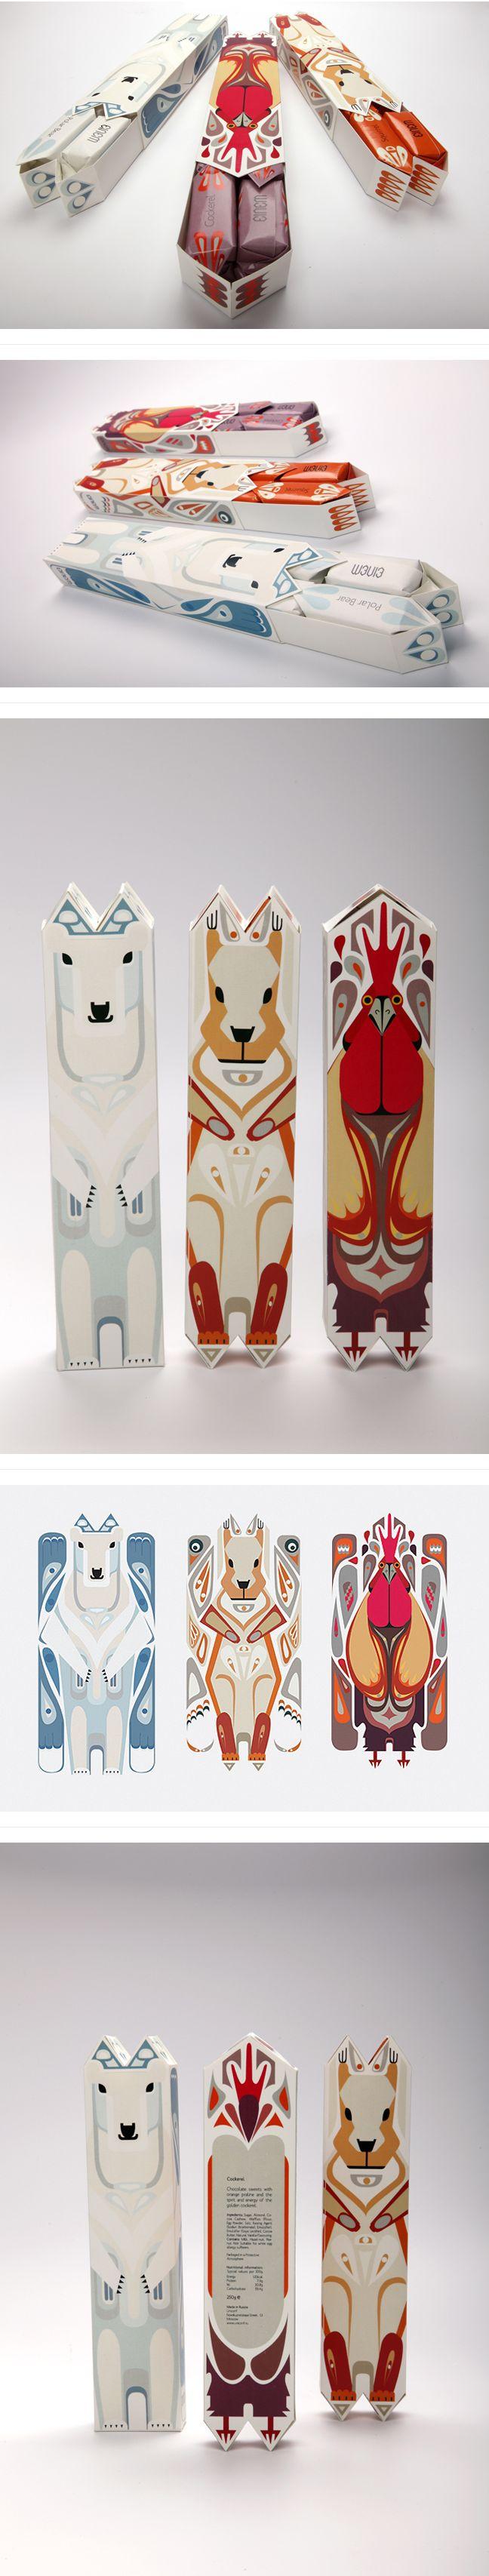 Julia Agisheva创意包装设计...